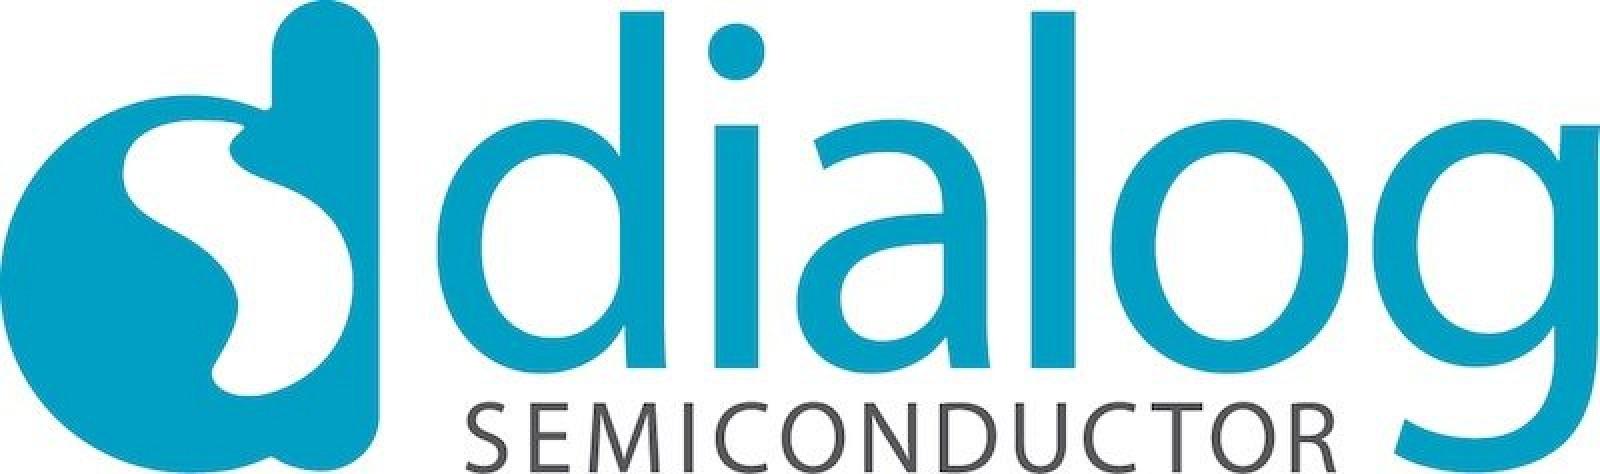 Dialog Semiconductor Aktienkurs Realtime